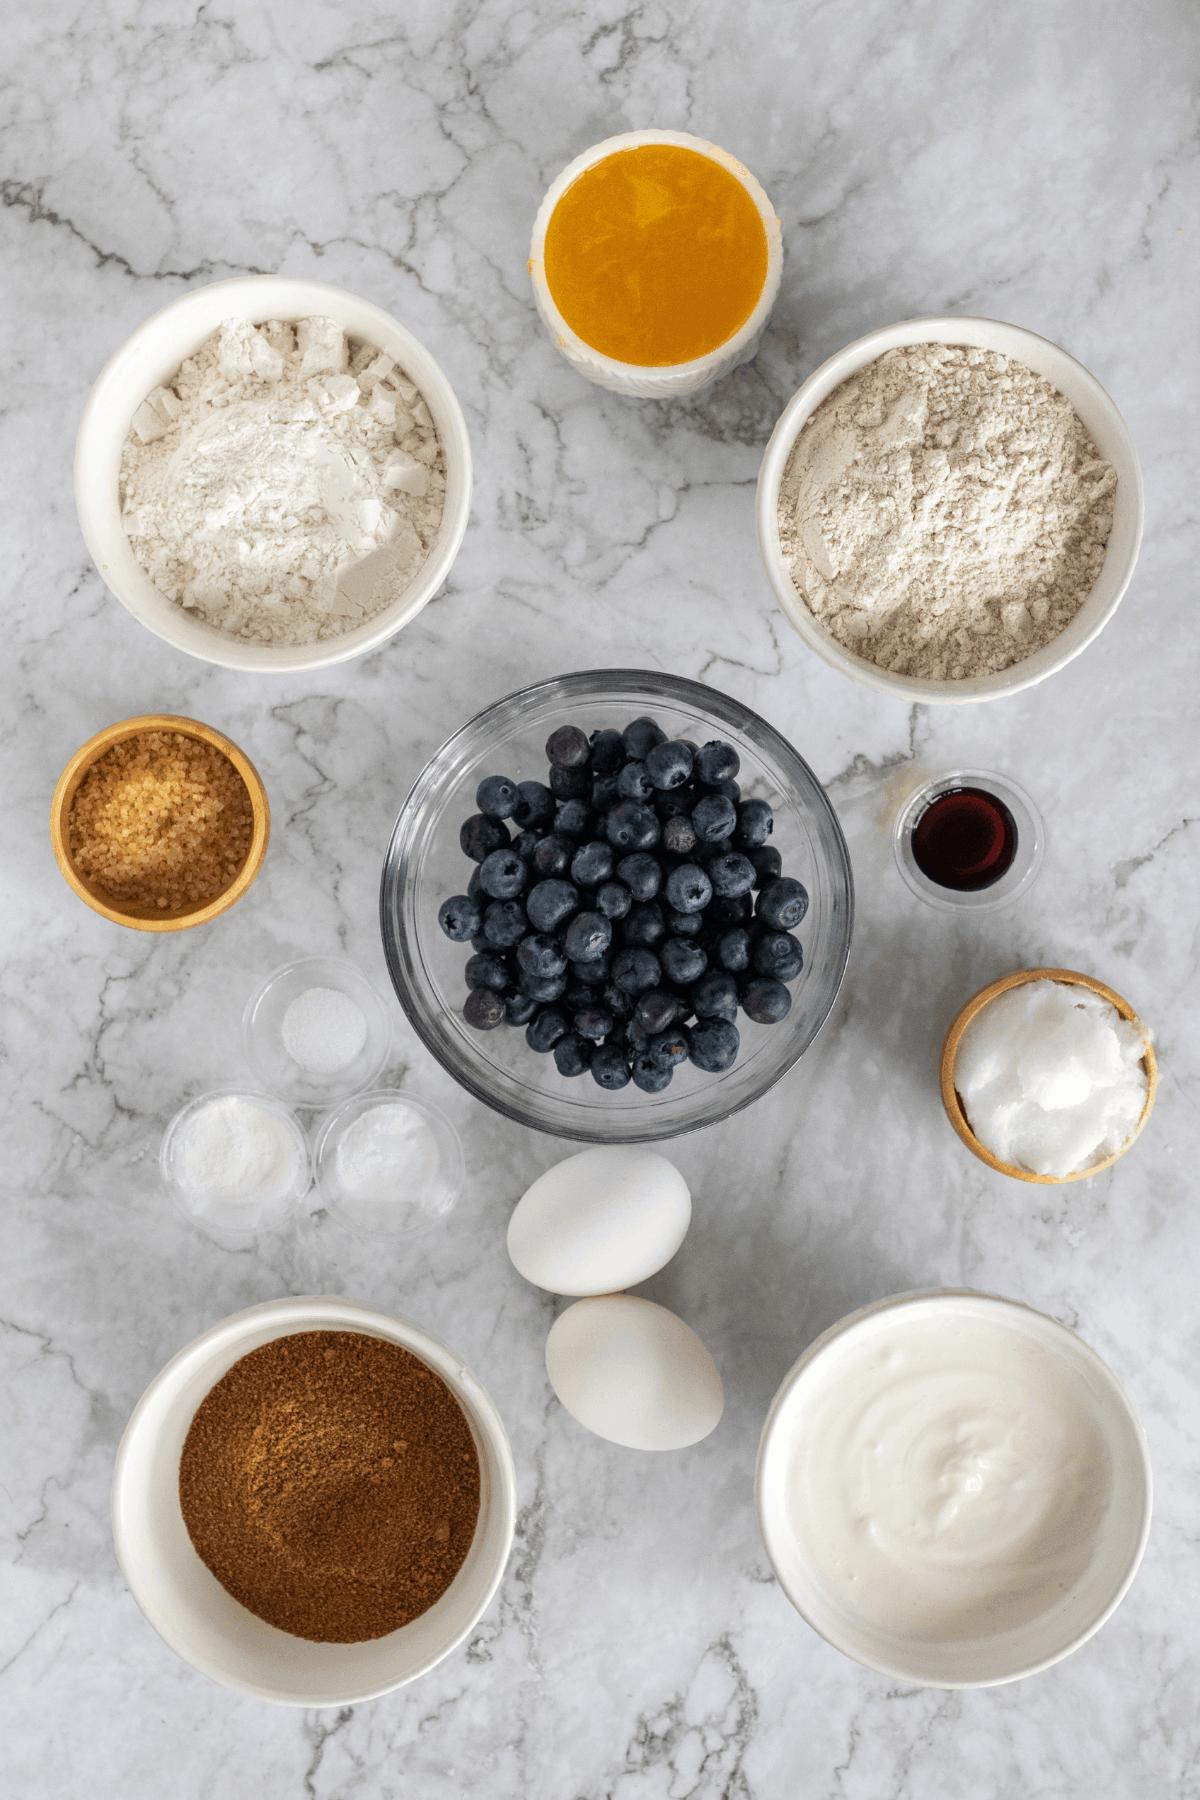 ingredients for make homemade blueberry Greek yogurt muffins from scratch.